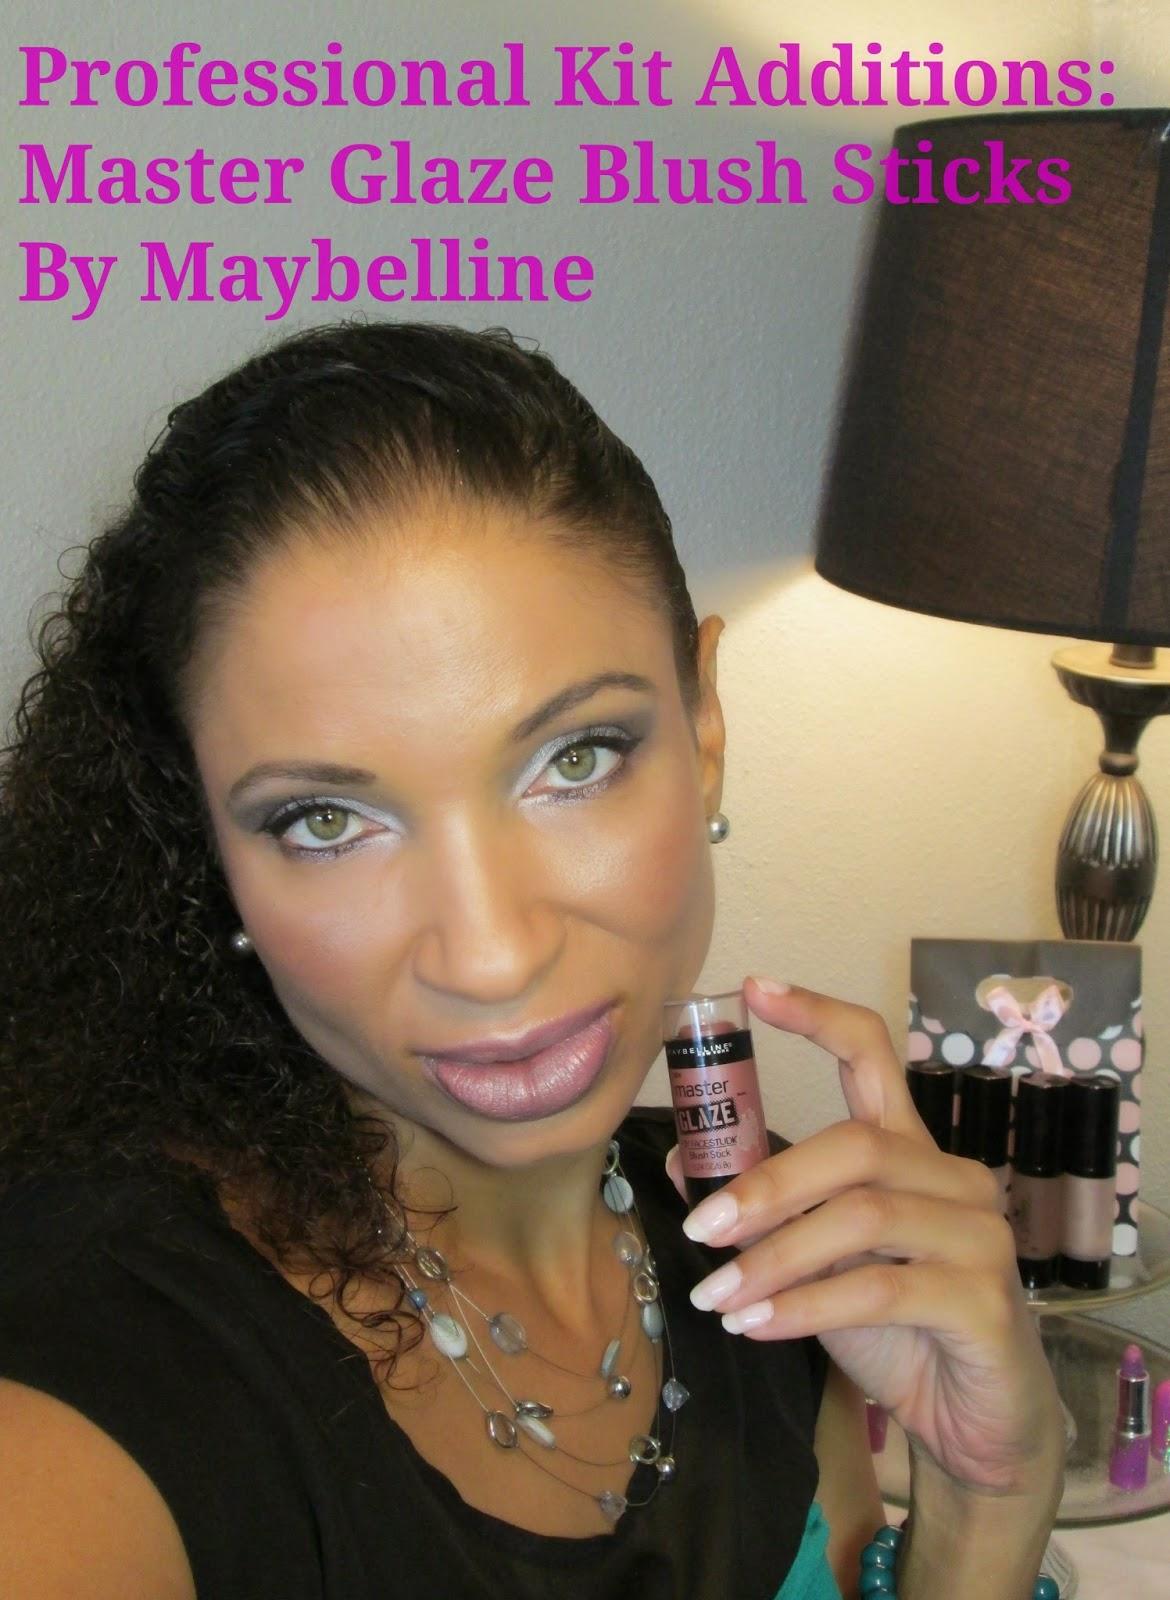 http://chrysalisbeautybag.blogspot.com/2014/09/professional-kit-additions-maybelline.html